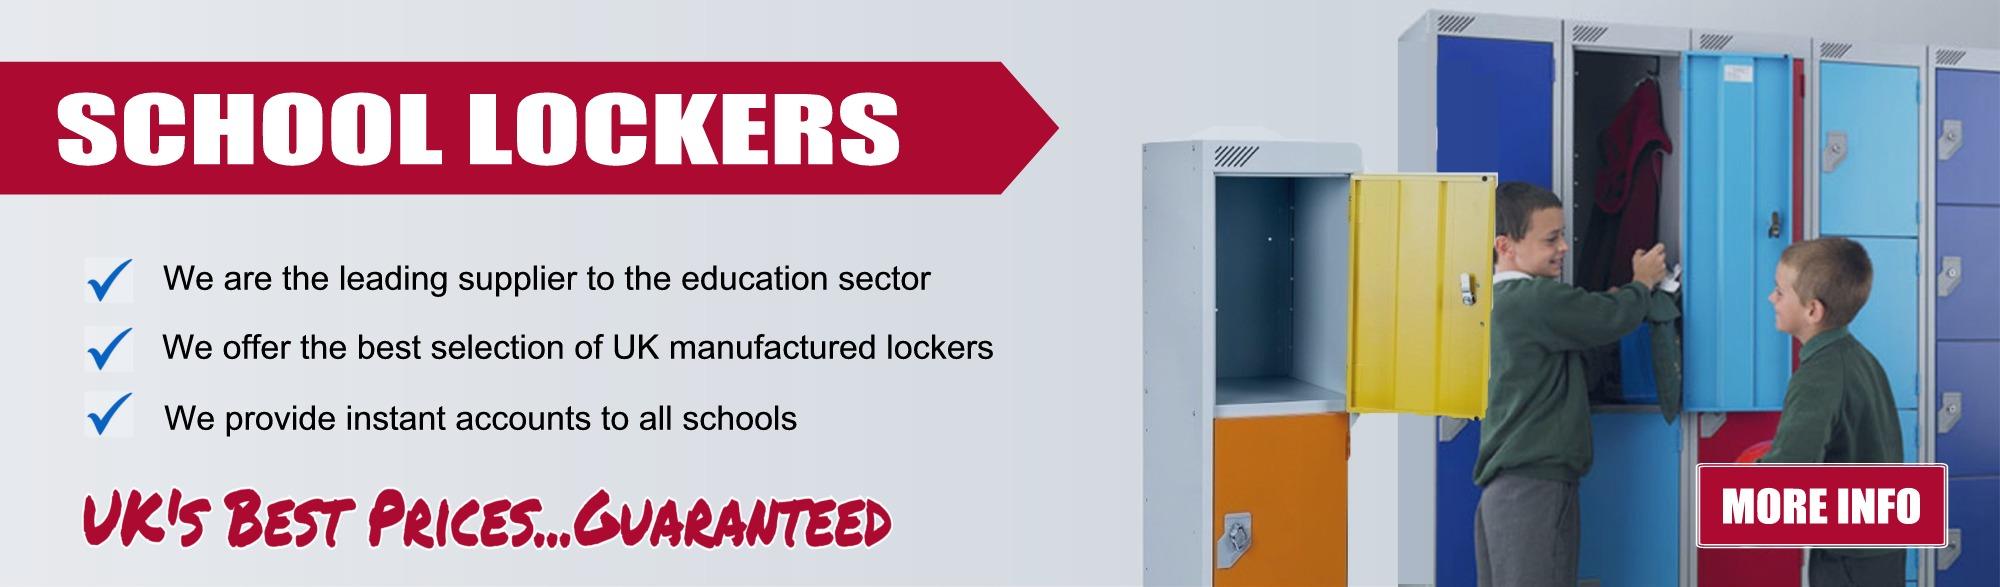 School Lockers, Special School Prices, Discounts for schools lockers